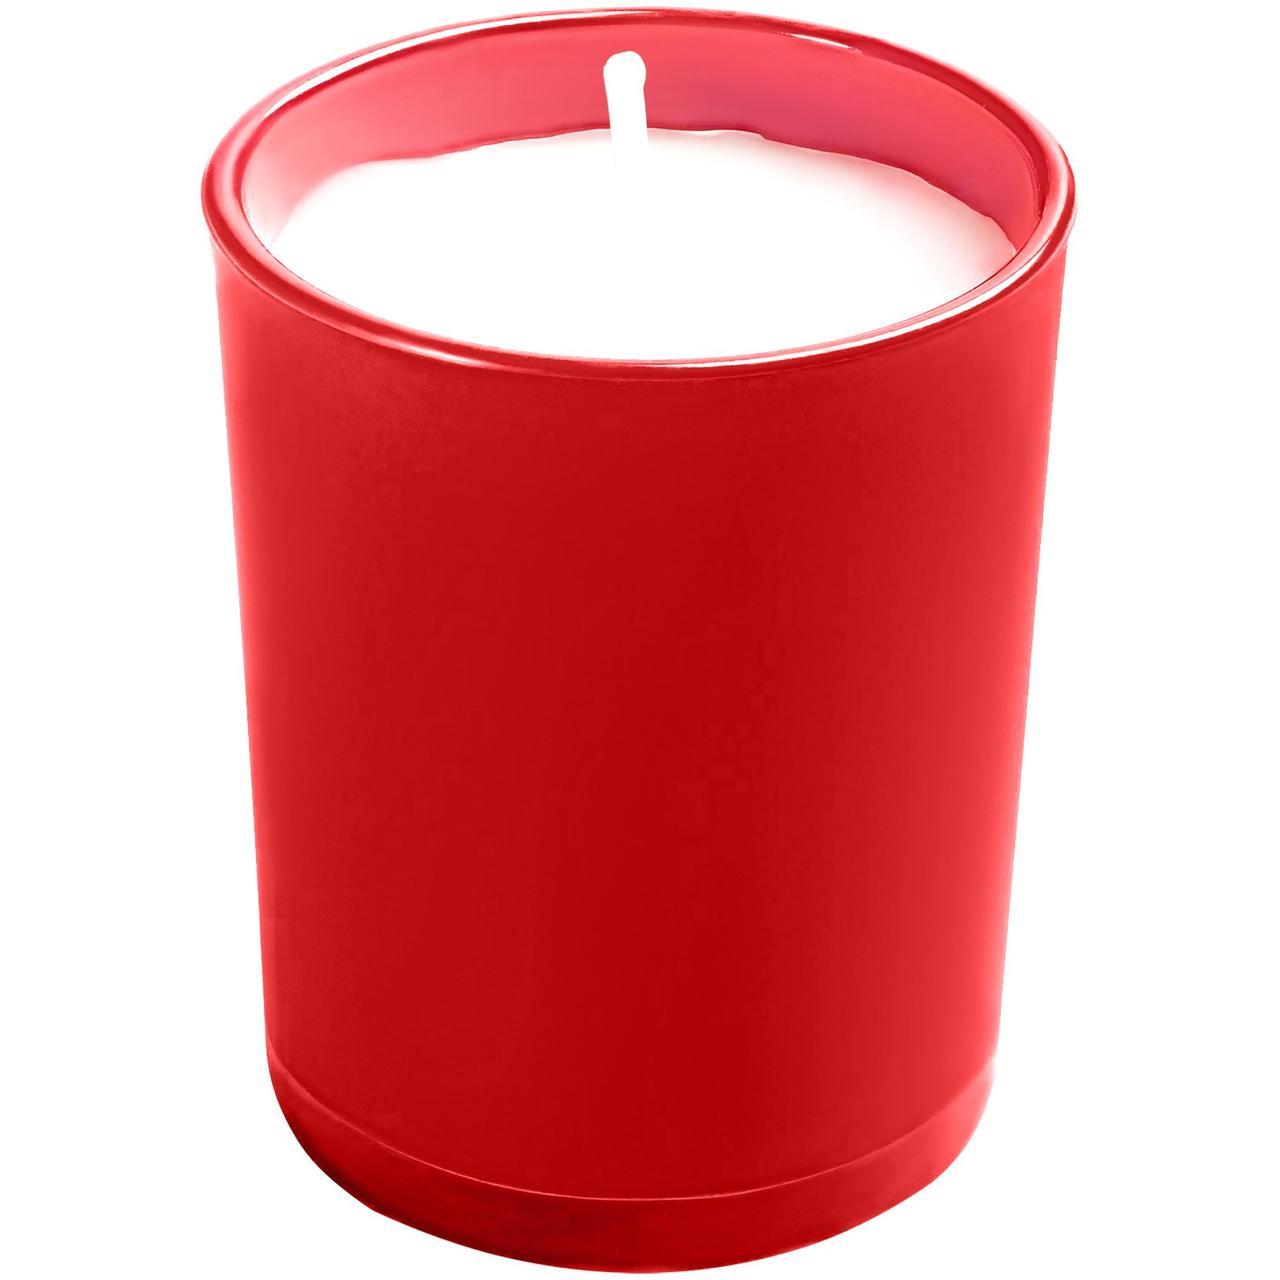 Свеча Glimmy, красная (артикул 7697.50)